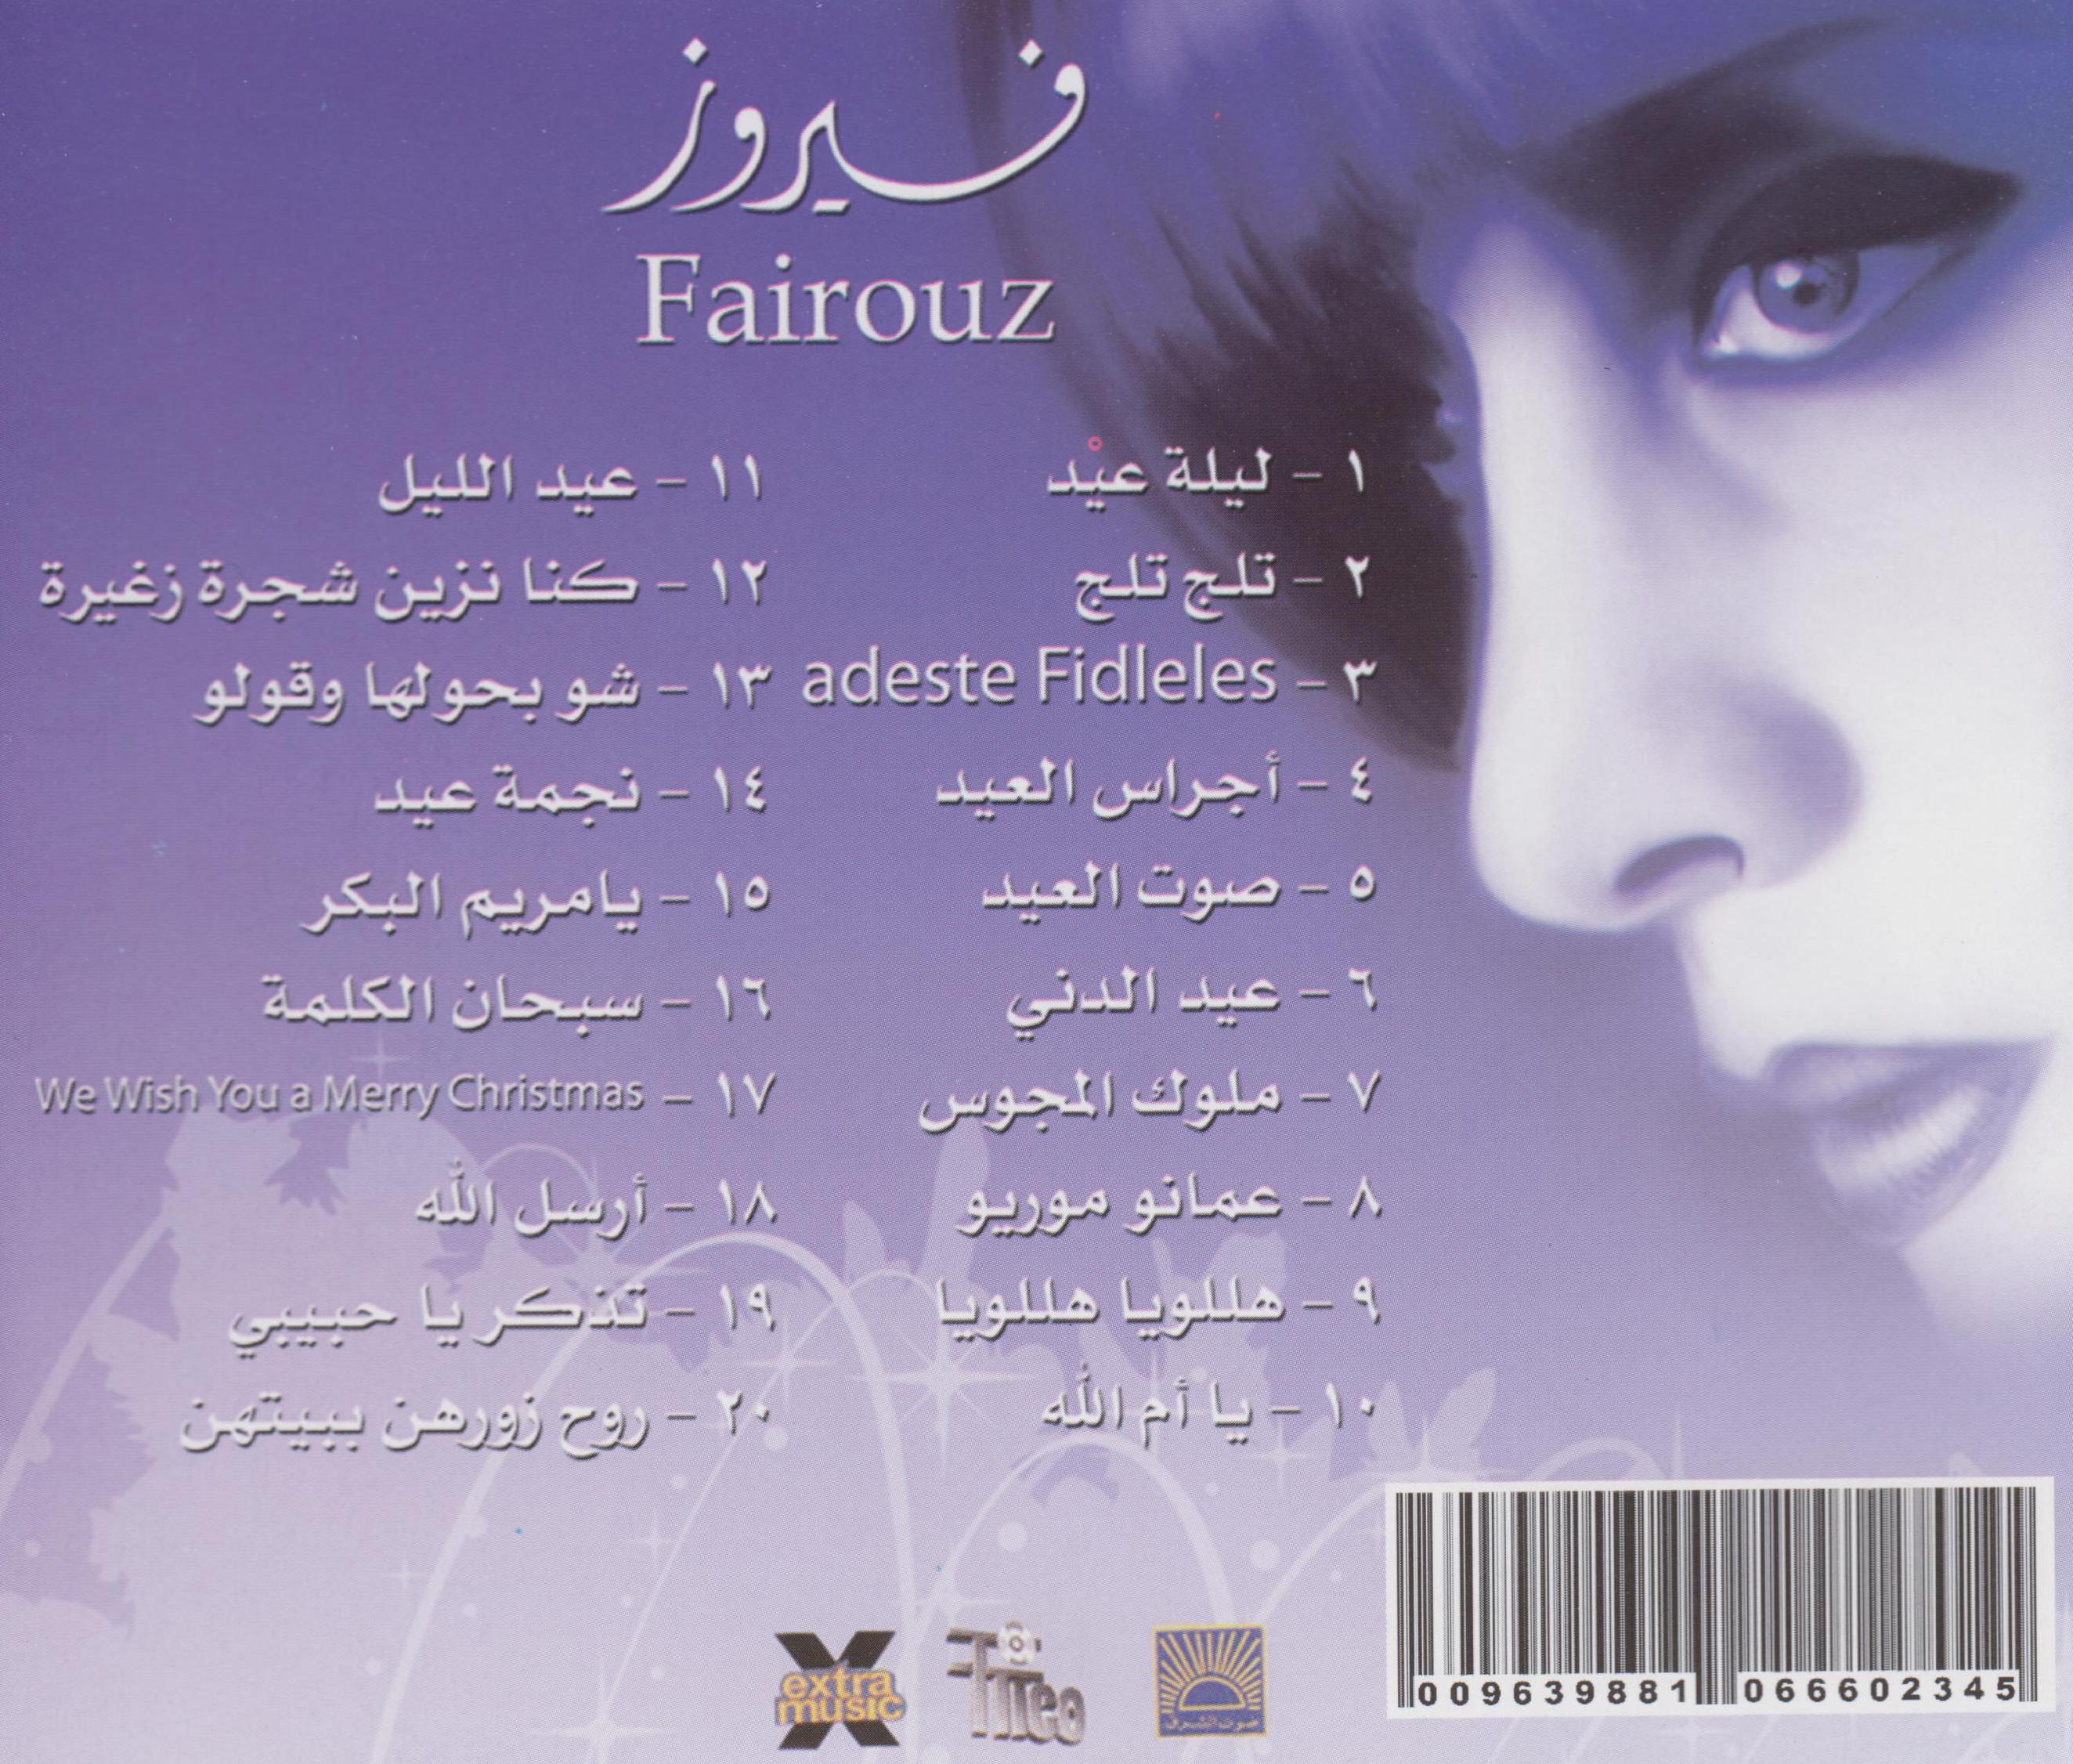 Fairouz Songs throughout fairuz - christmas songs - nouri brothers